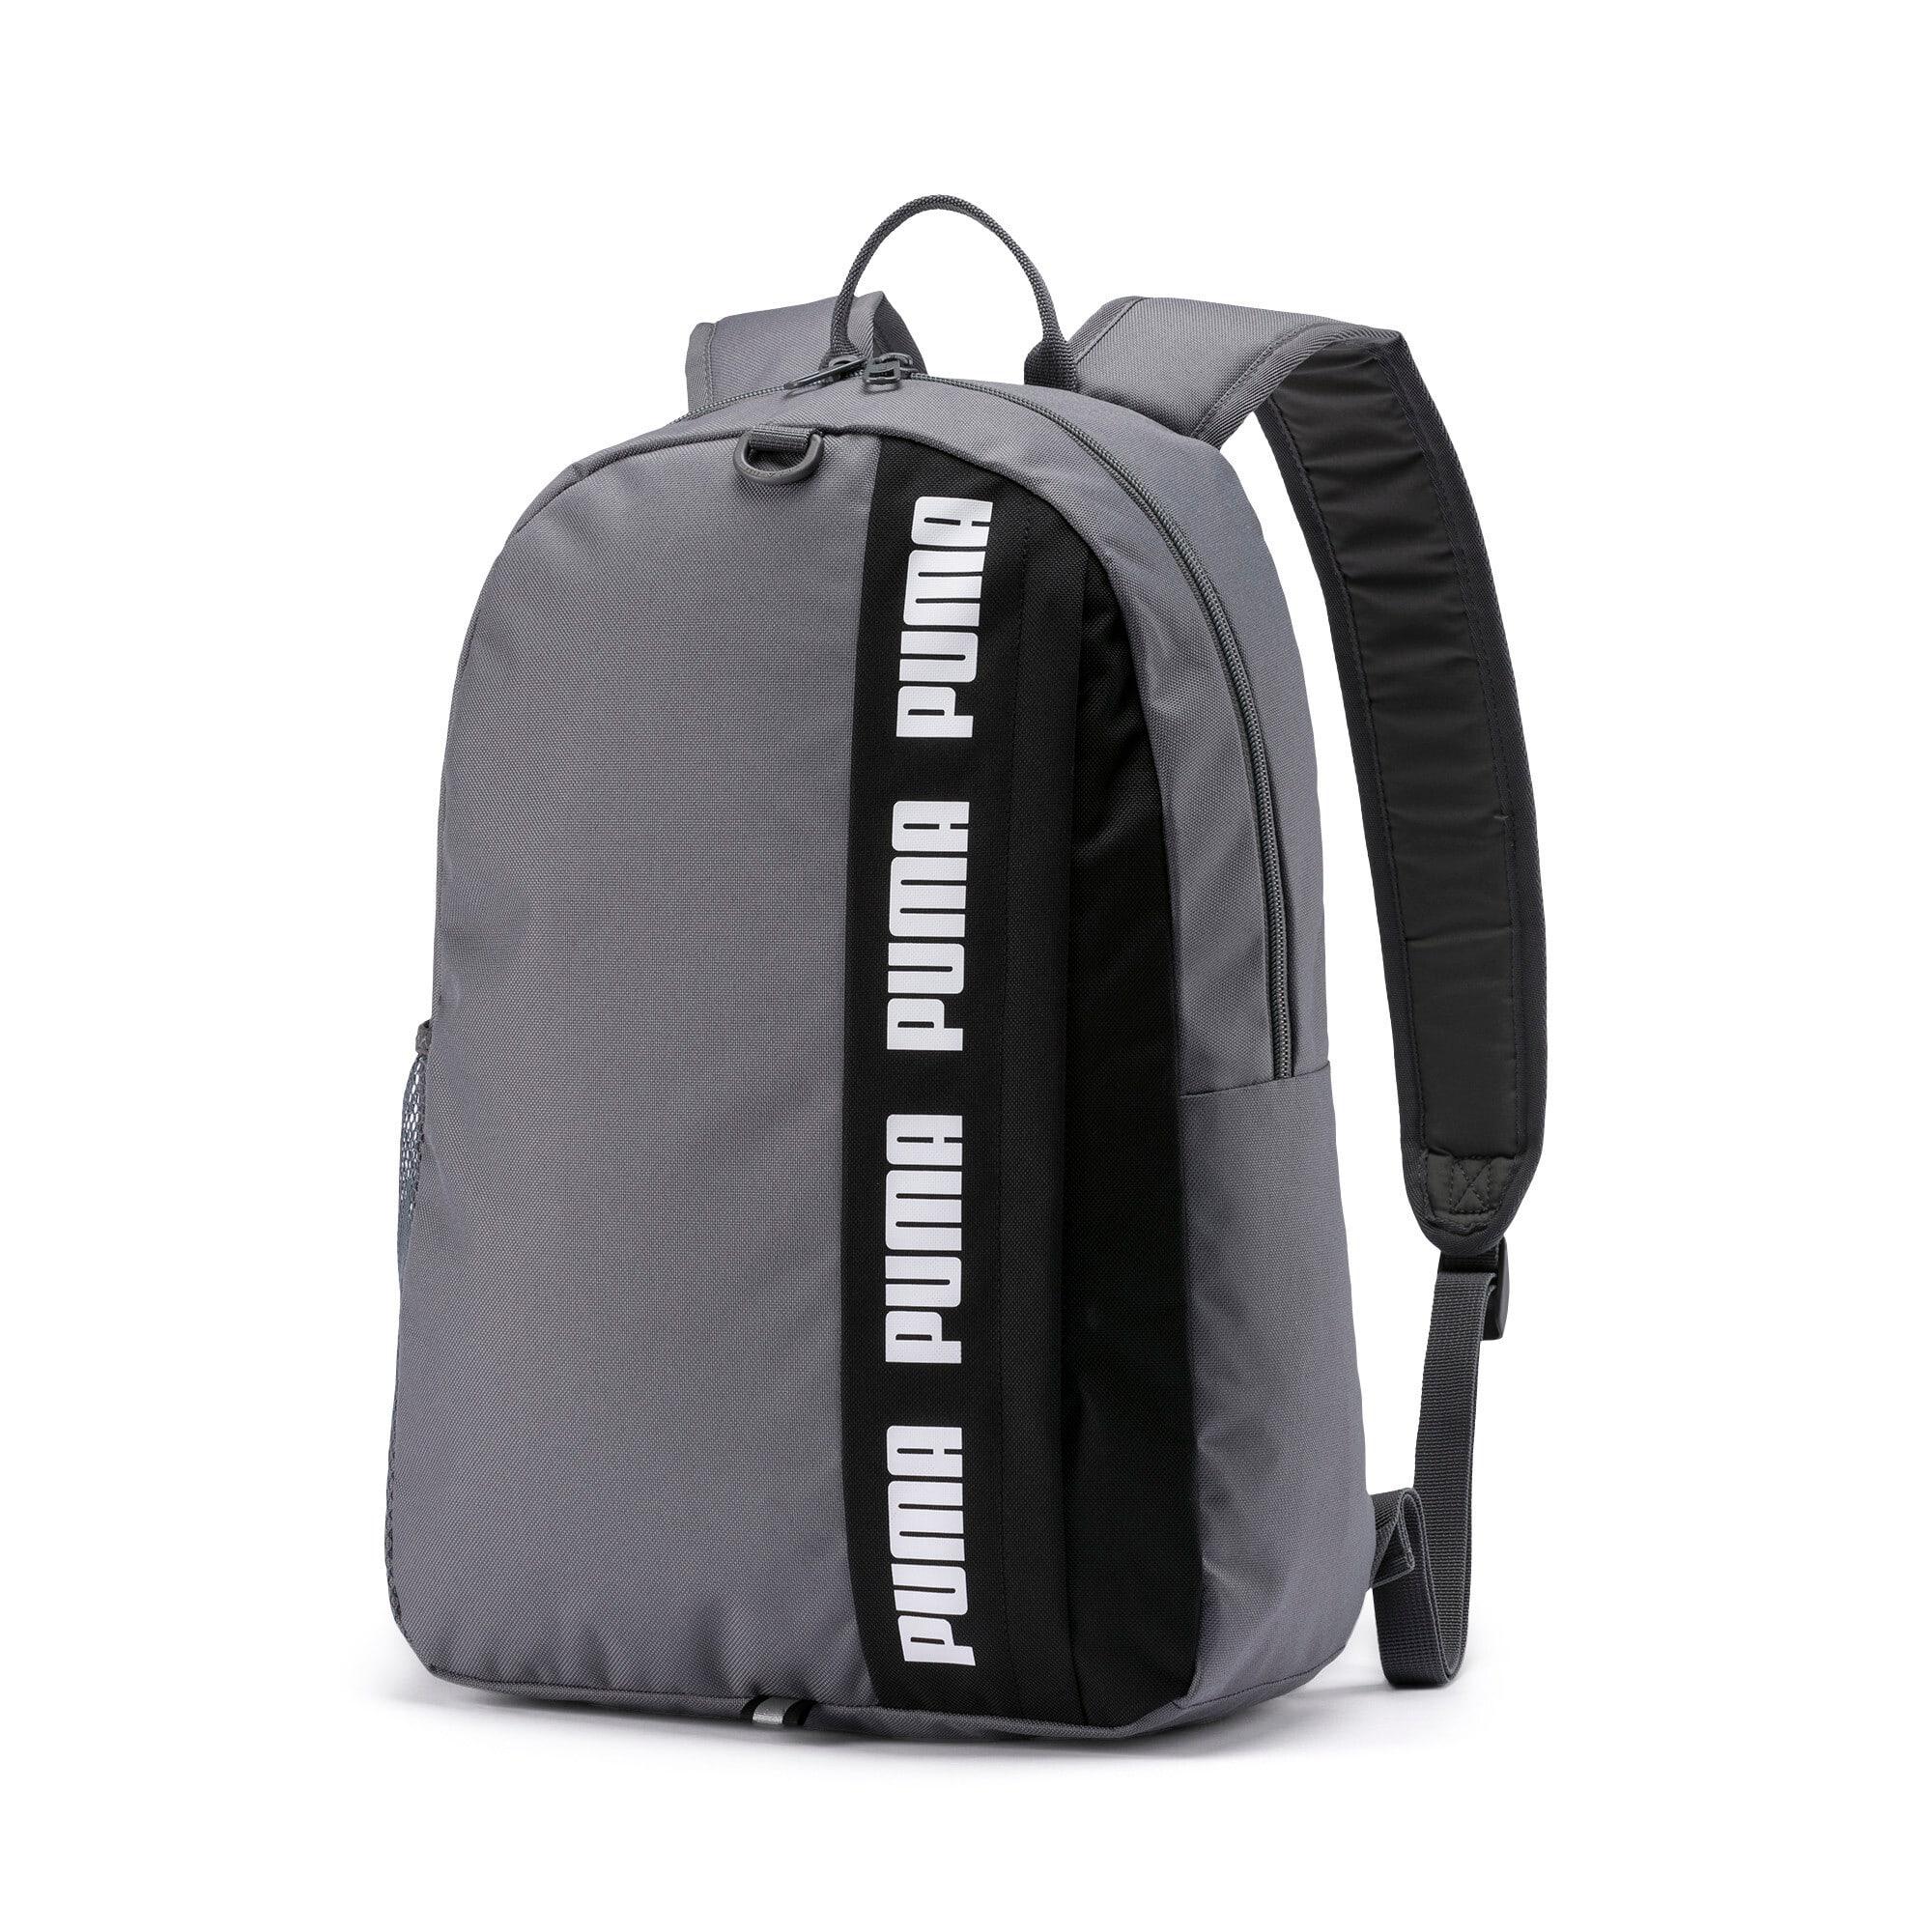 Thumbnail 1 of PUMA Phase Backpack II, CASTLEROCK, medium